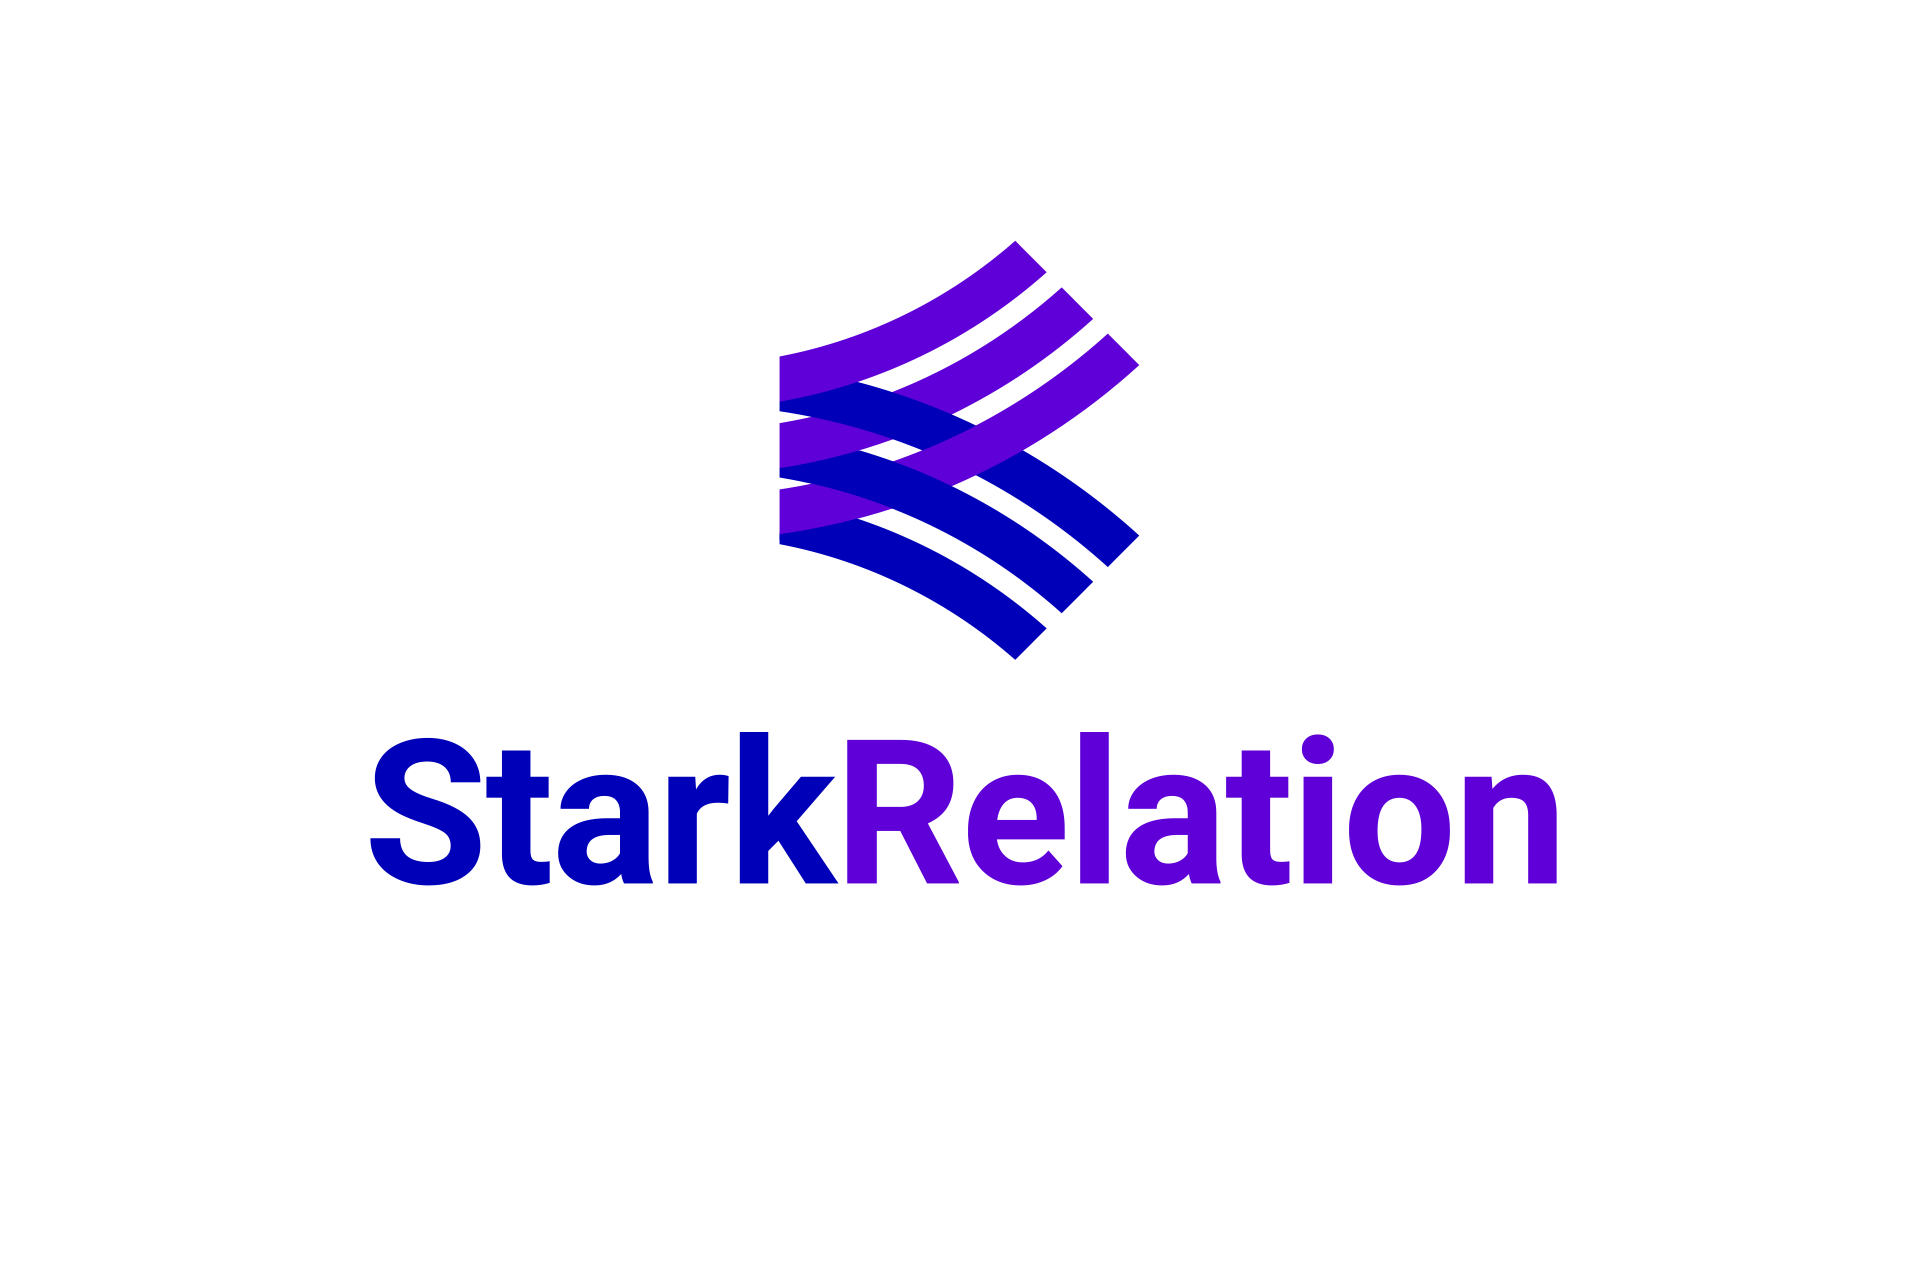 stark-relation-logotype-design